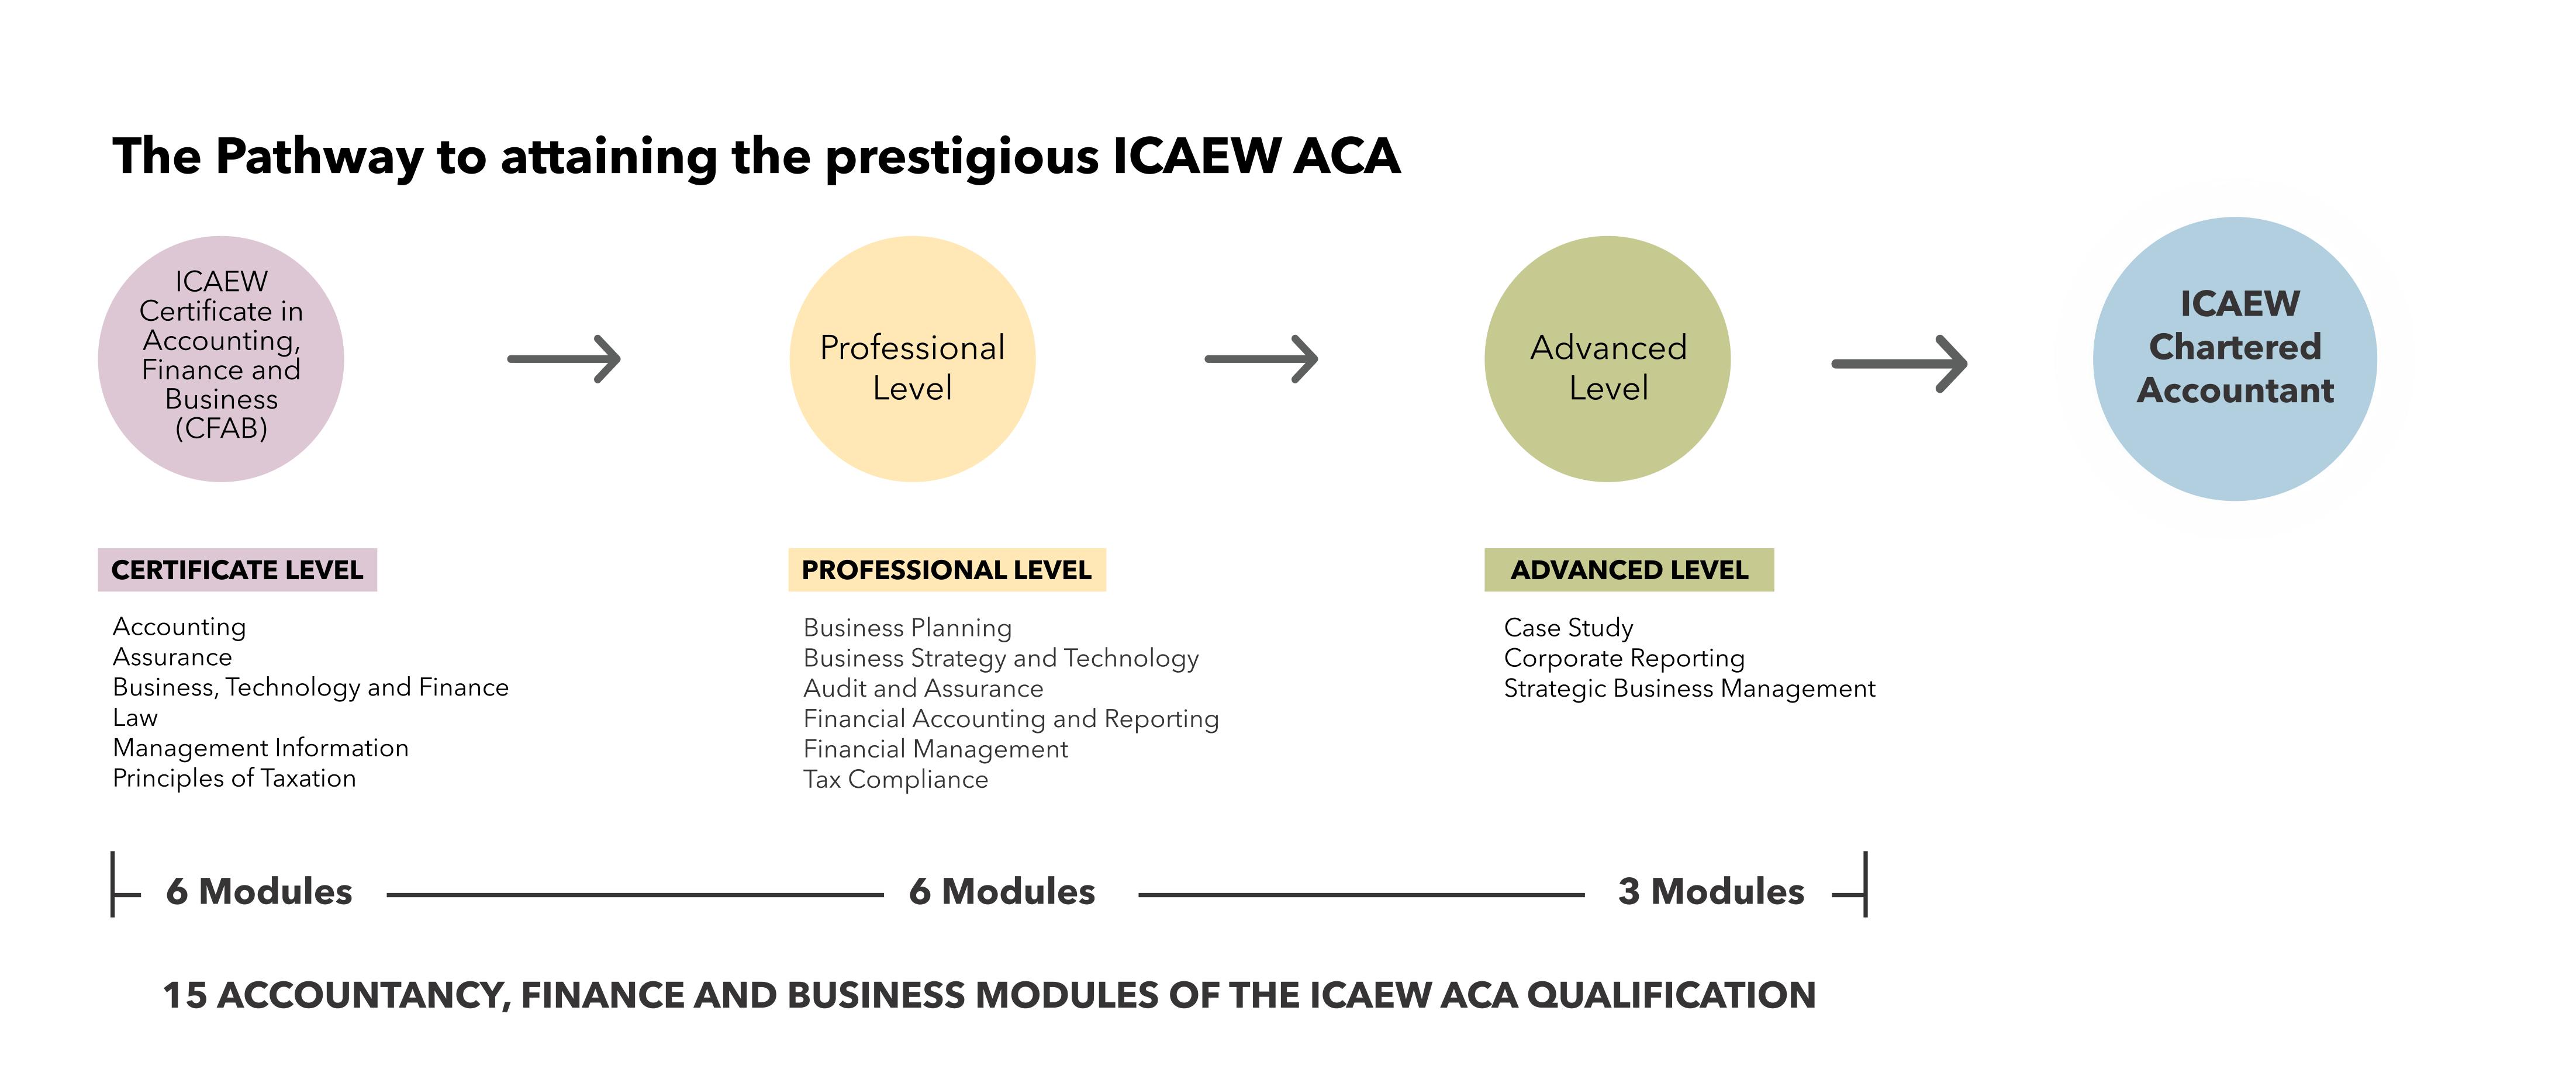 ACA training in UAE | Find your route | ICAEW Careers